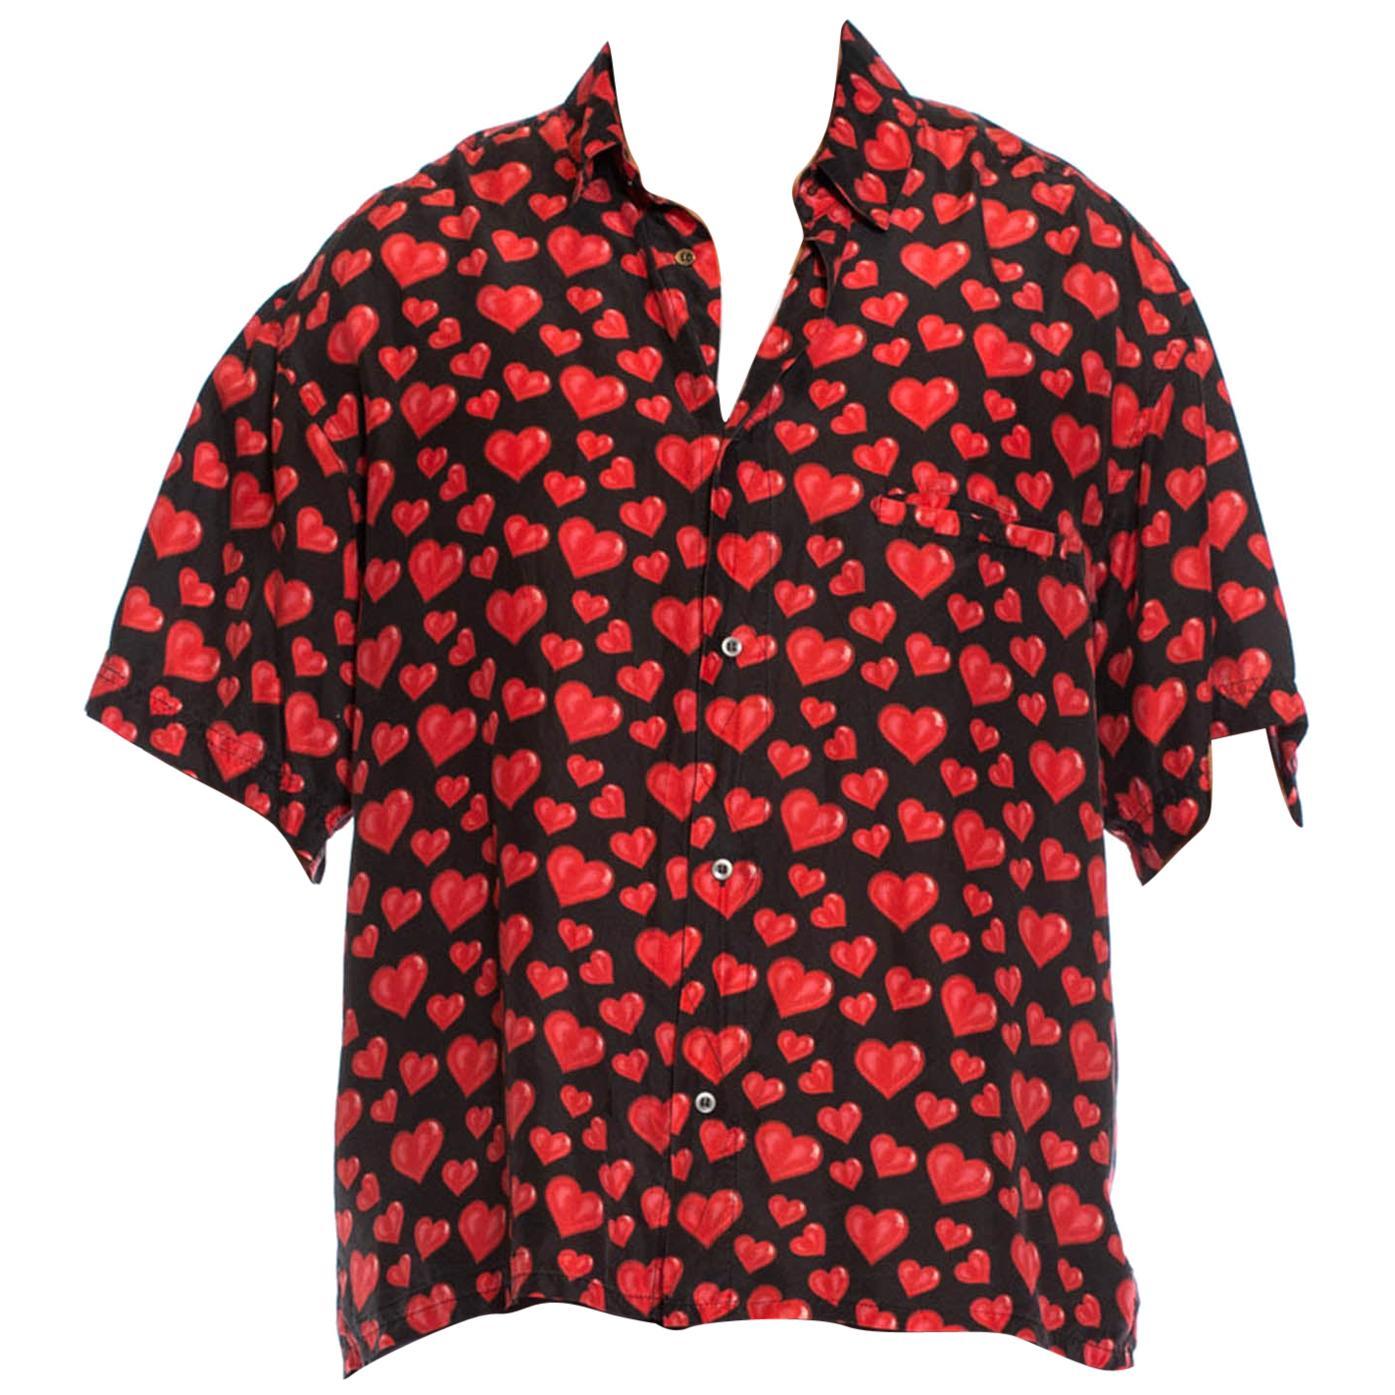 1980S Black Washed Silk Pink Loverboy Heart Printed Men's Shirt